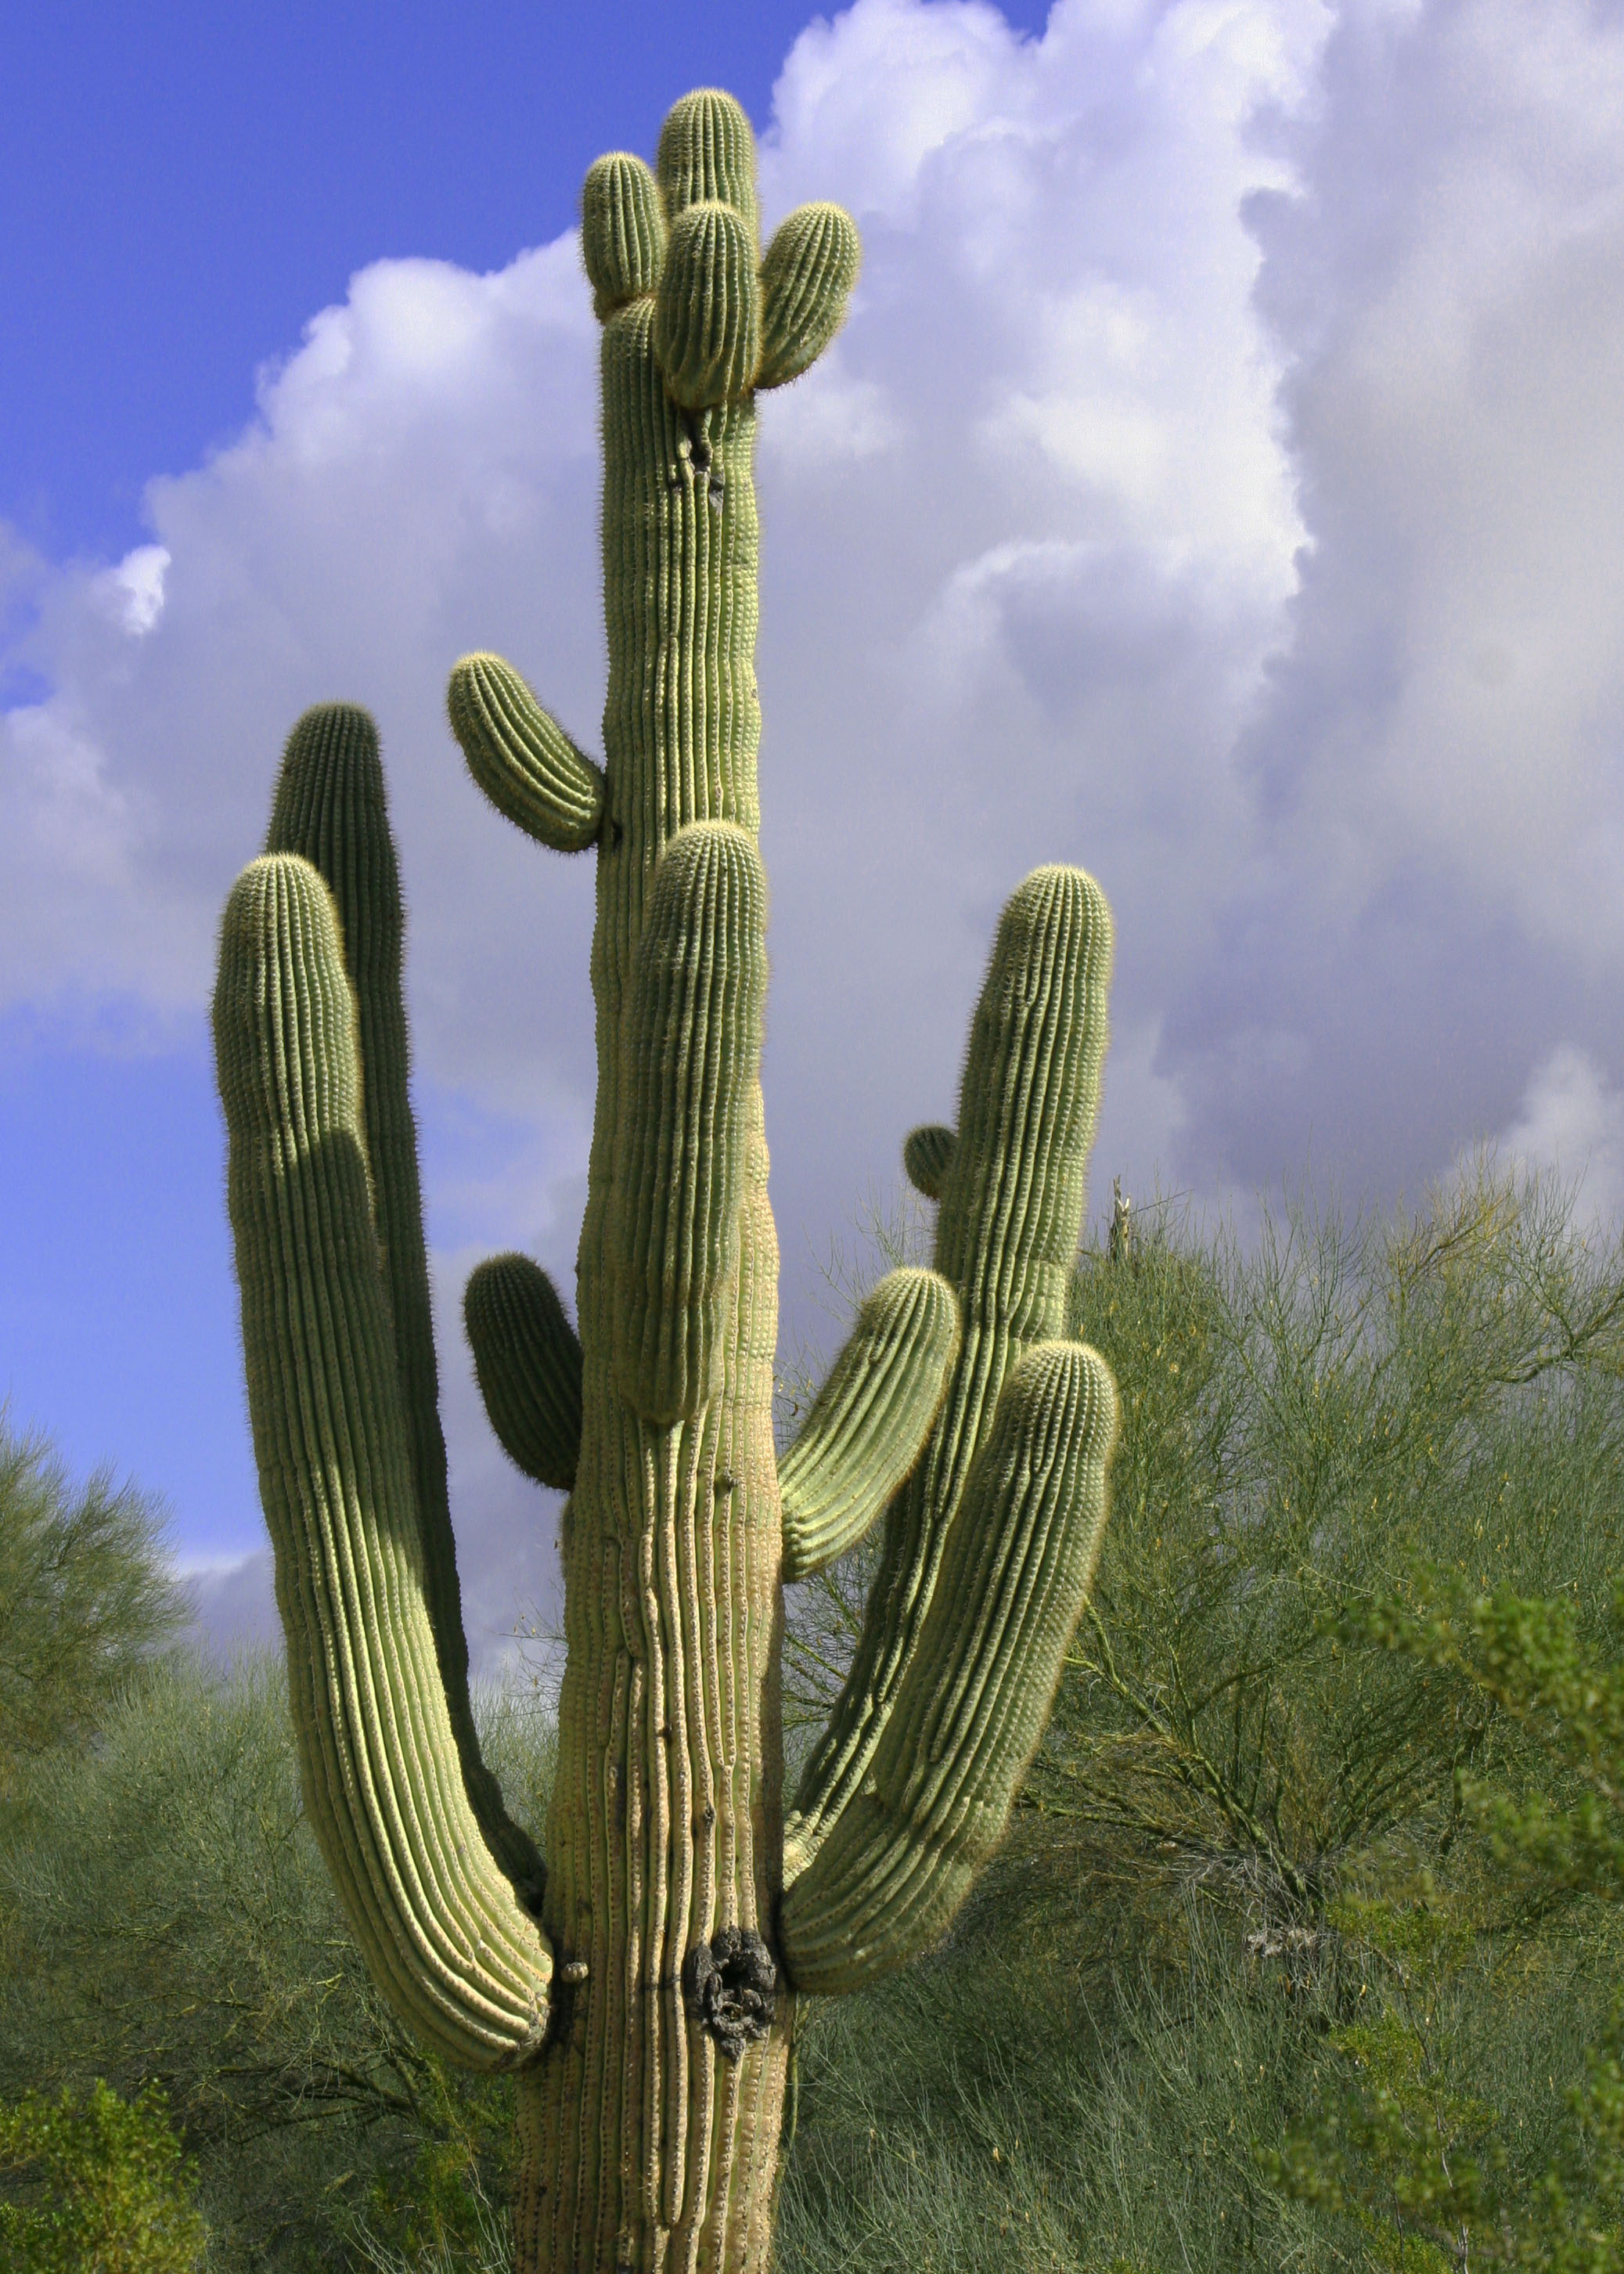 Saguaro Cactus Wandering Through Time And Place